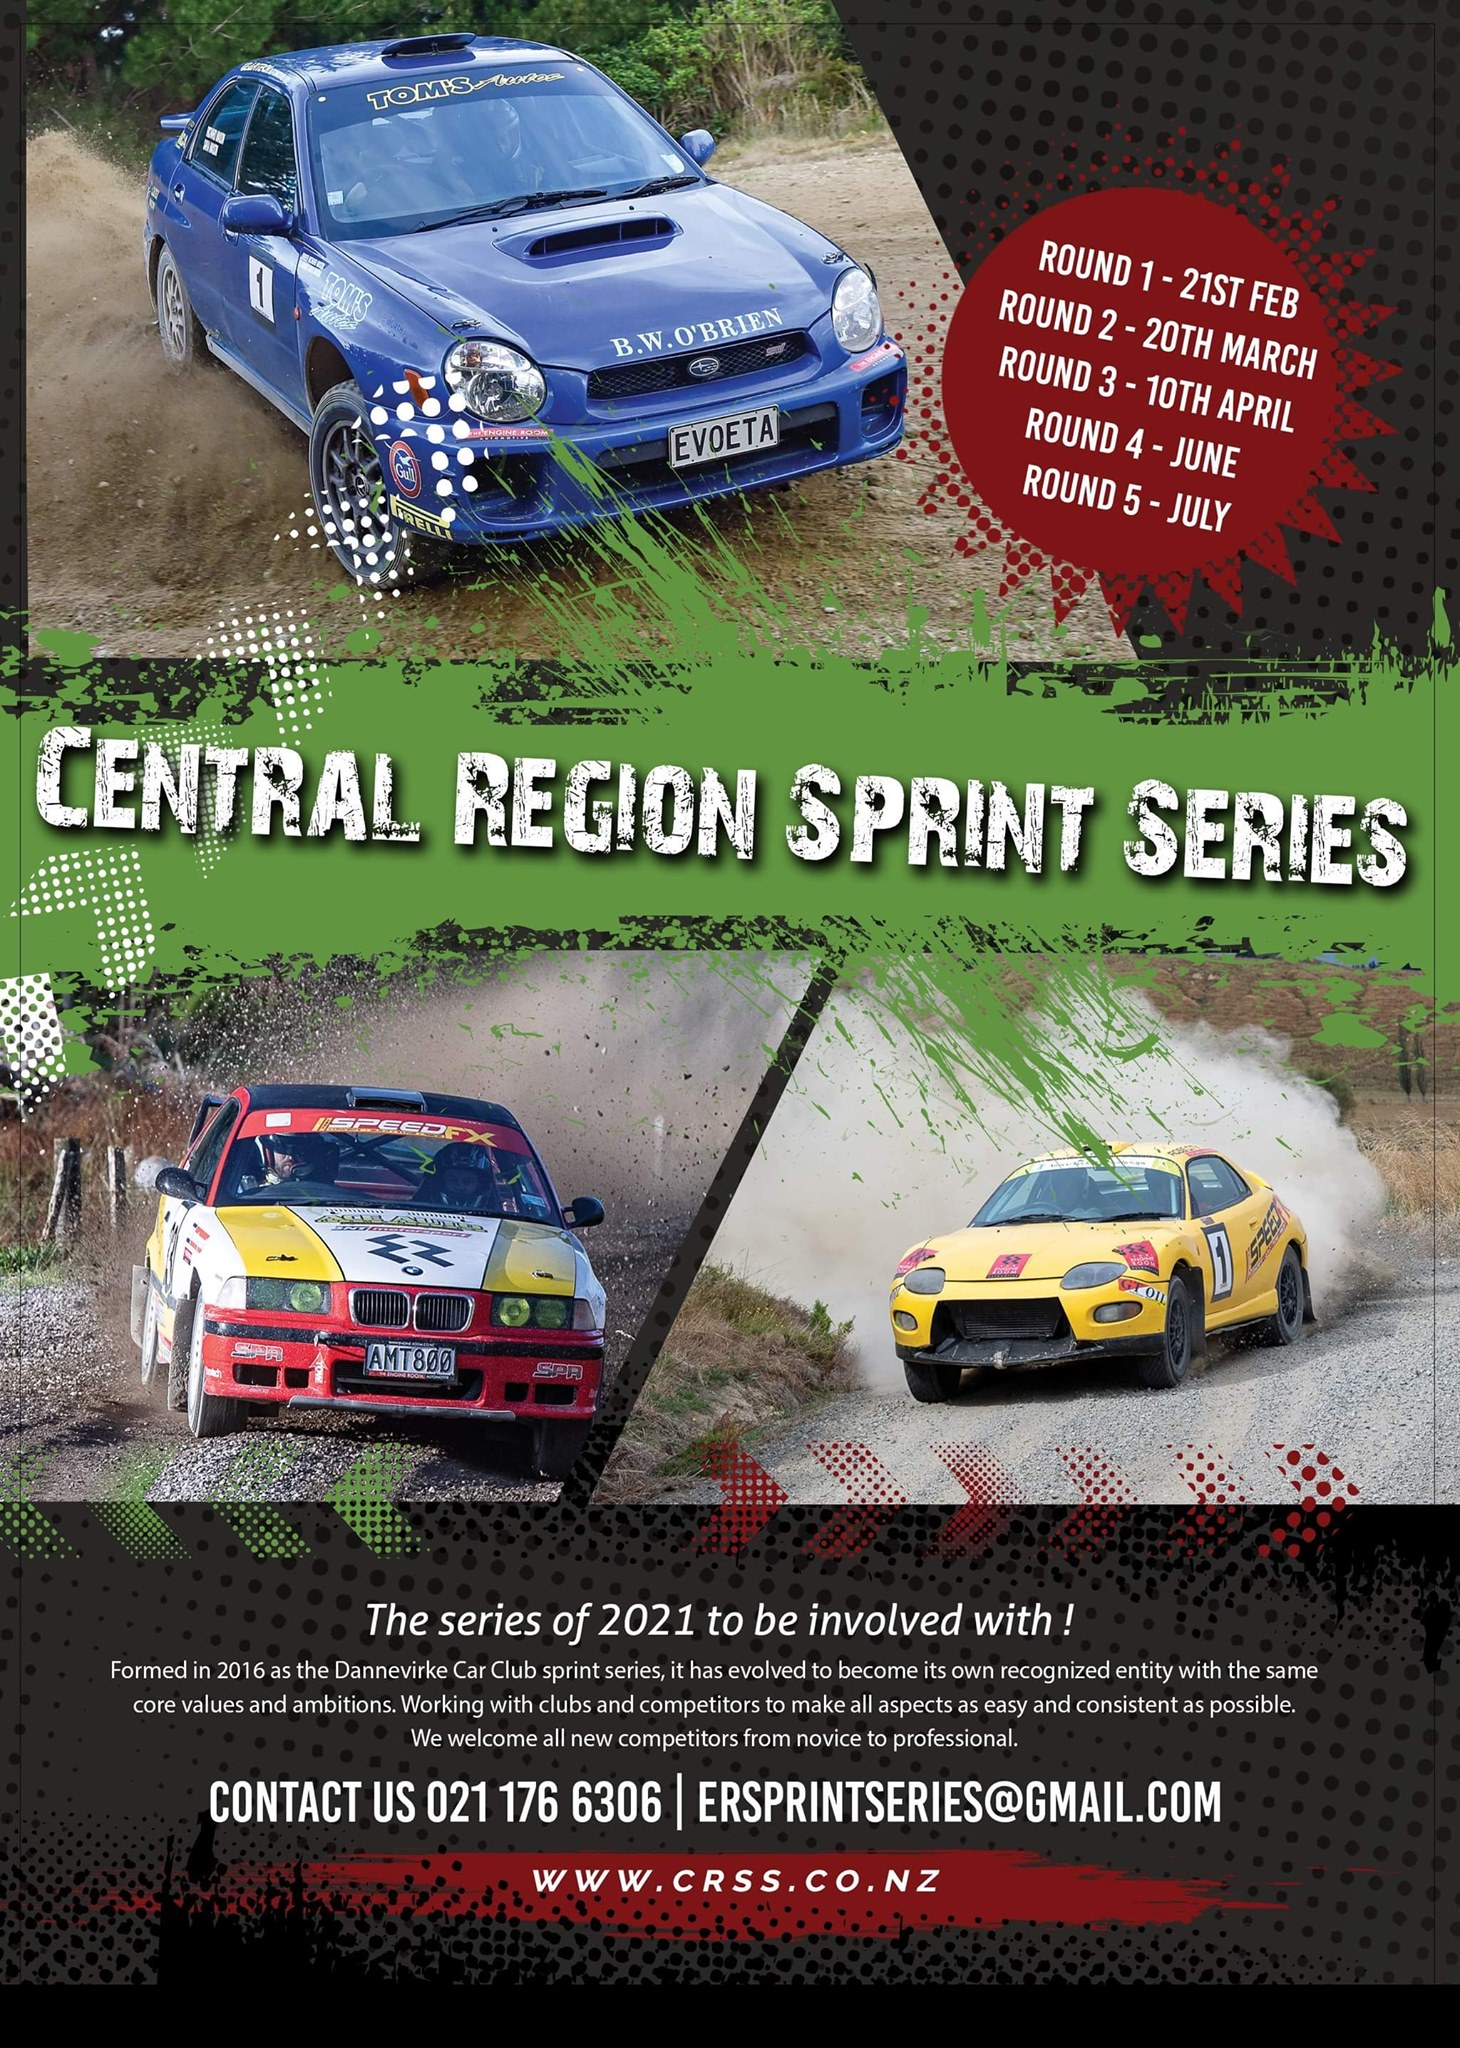 Pararorangi Road Rallysprint